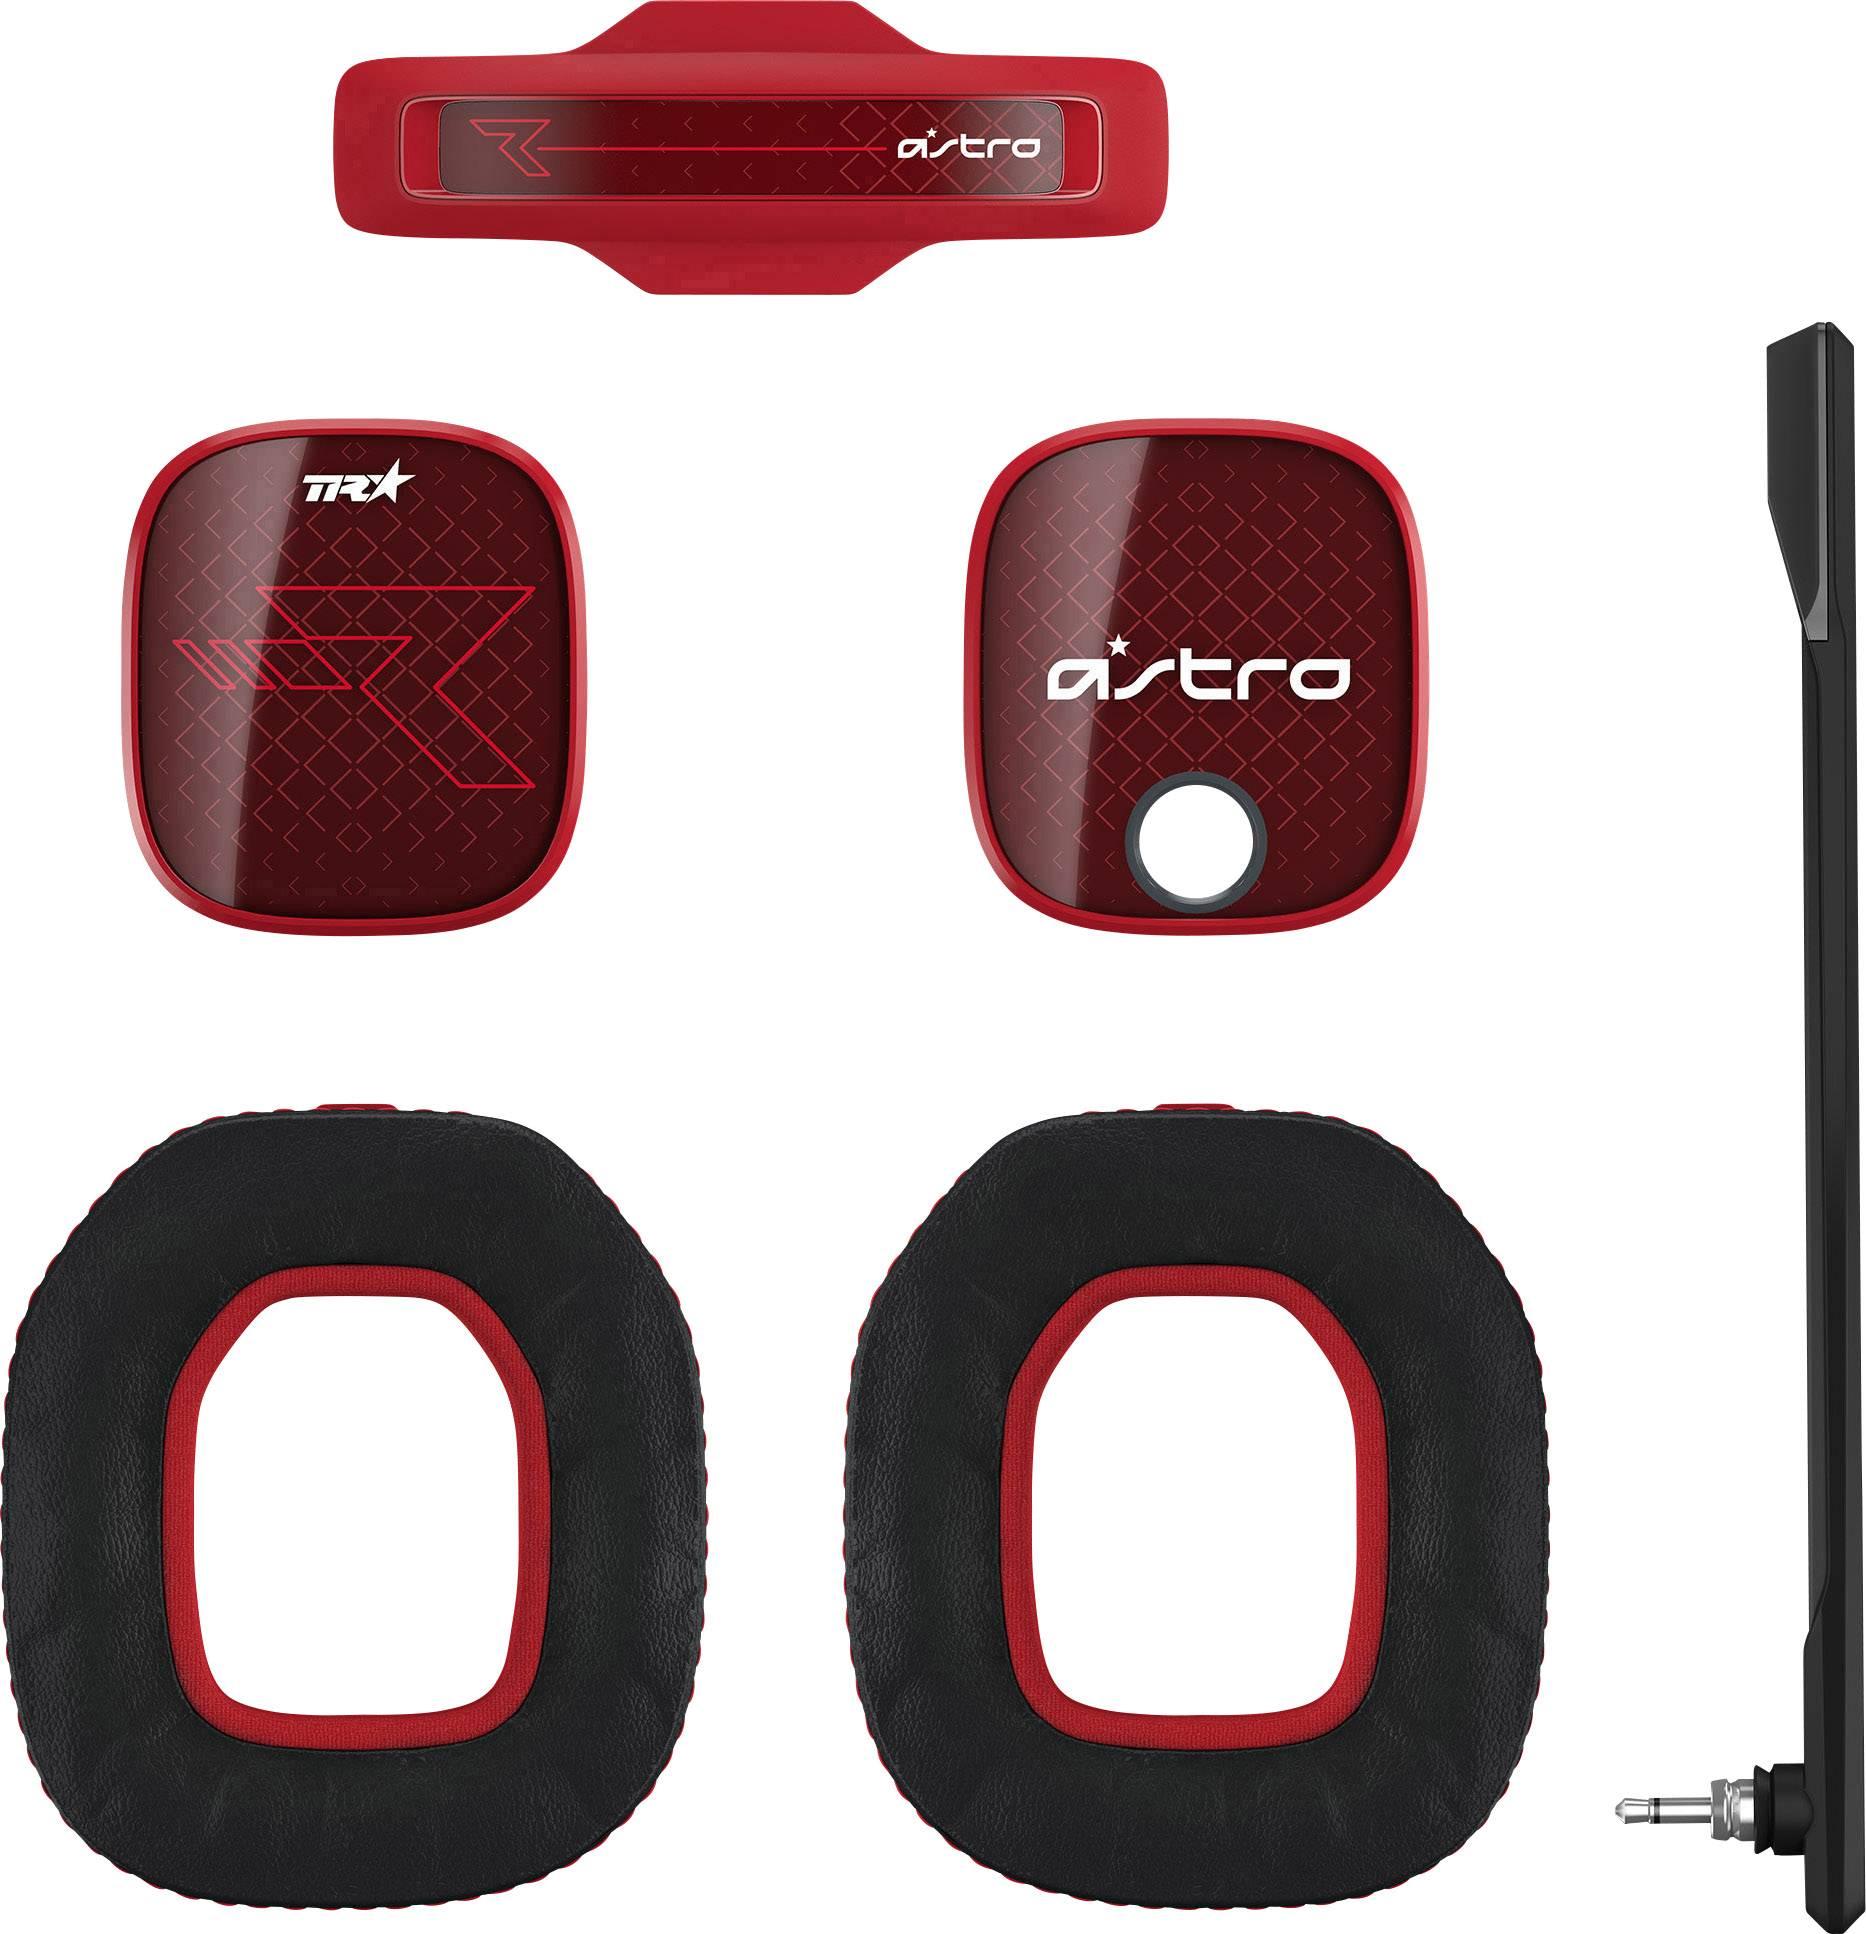 Astro A40TR Mod Kit Red Cuffia Headset per Gaming Mod Kit Rosso, Nero